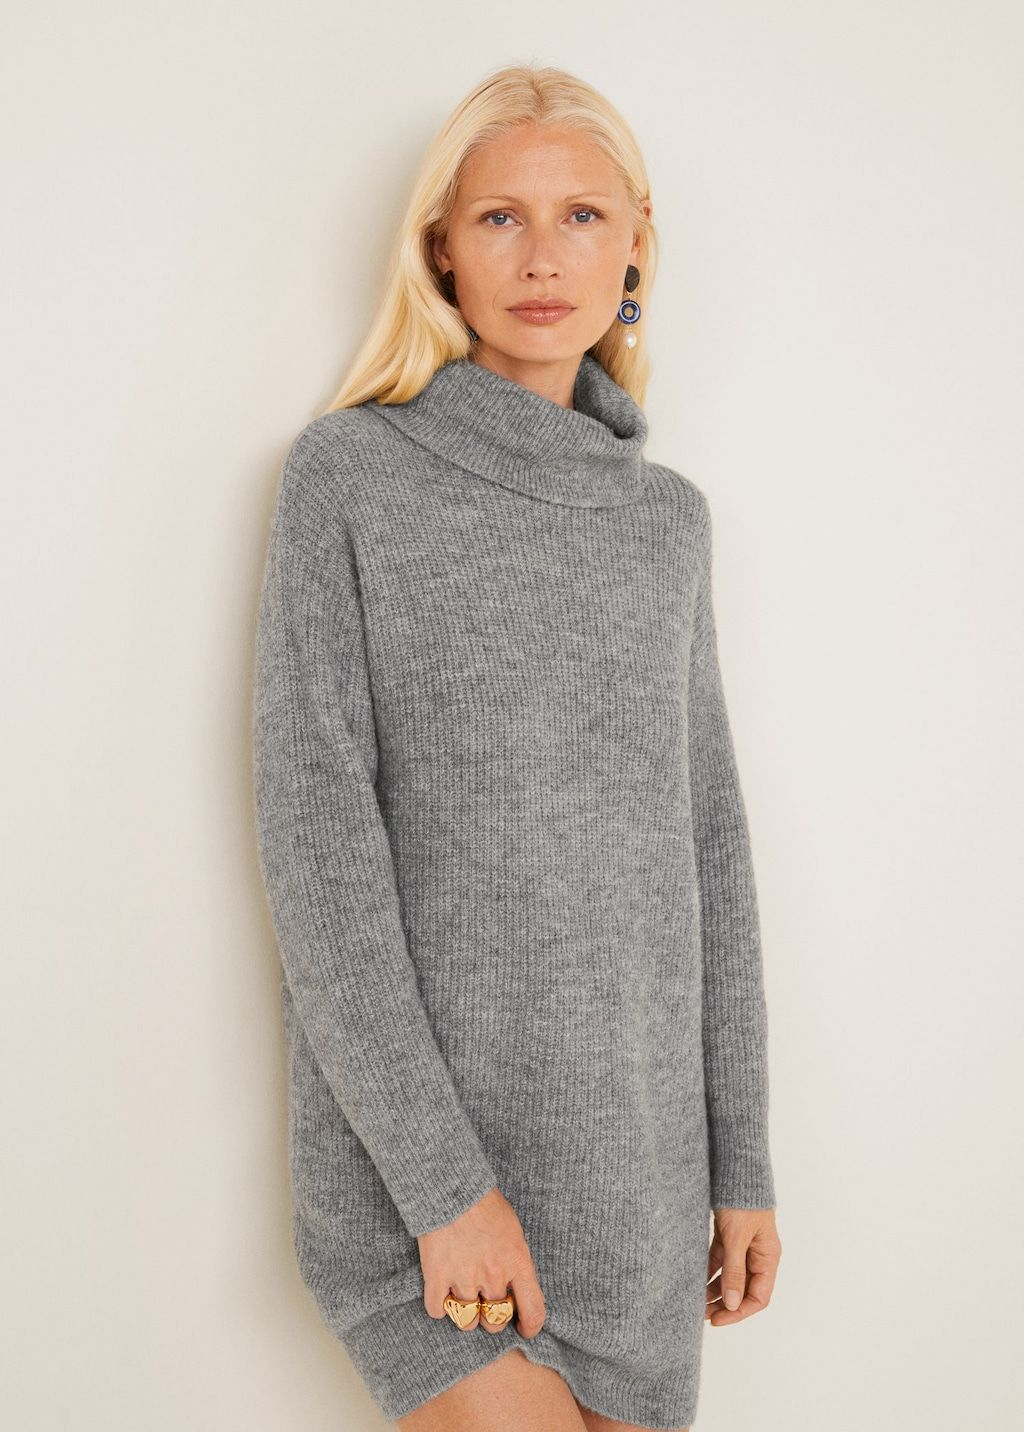 729a4d67cd0489 Tricot jurk ribdetails - Dames in 2018